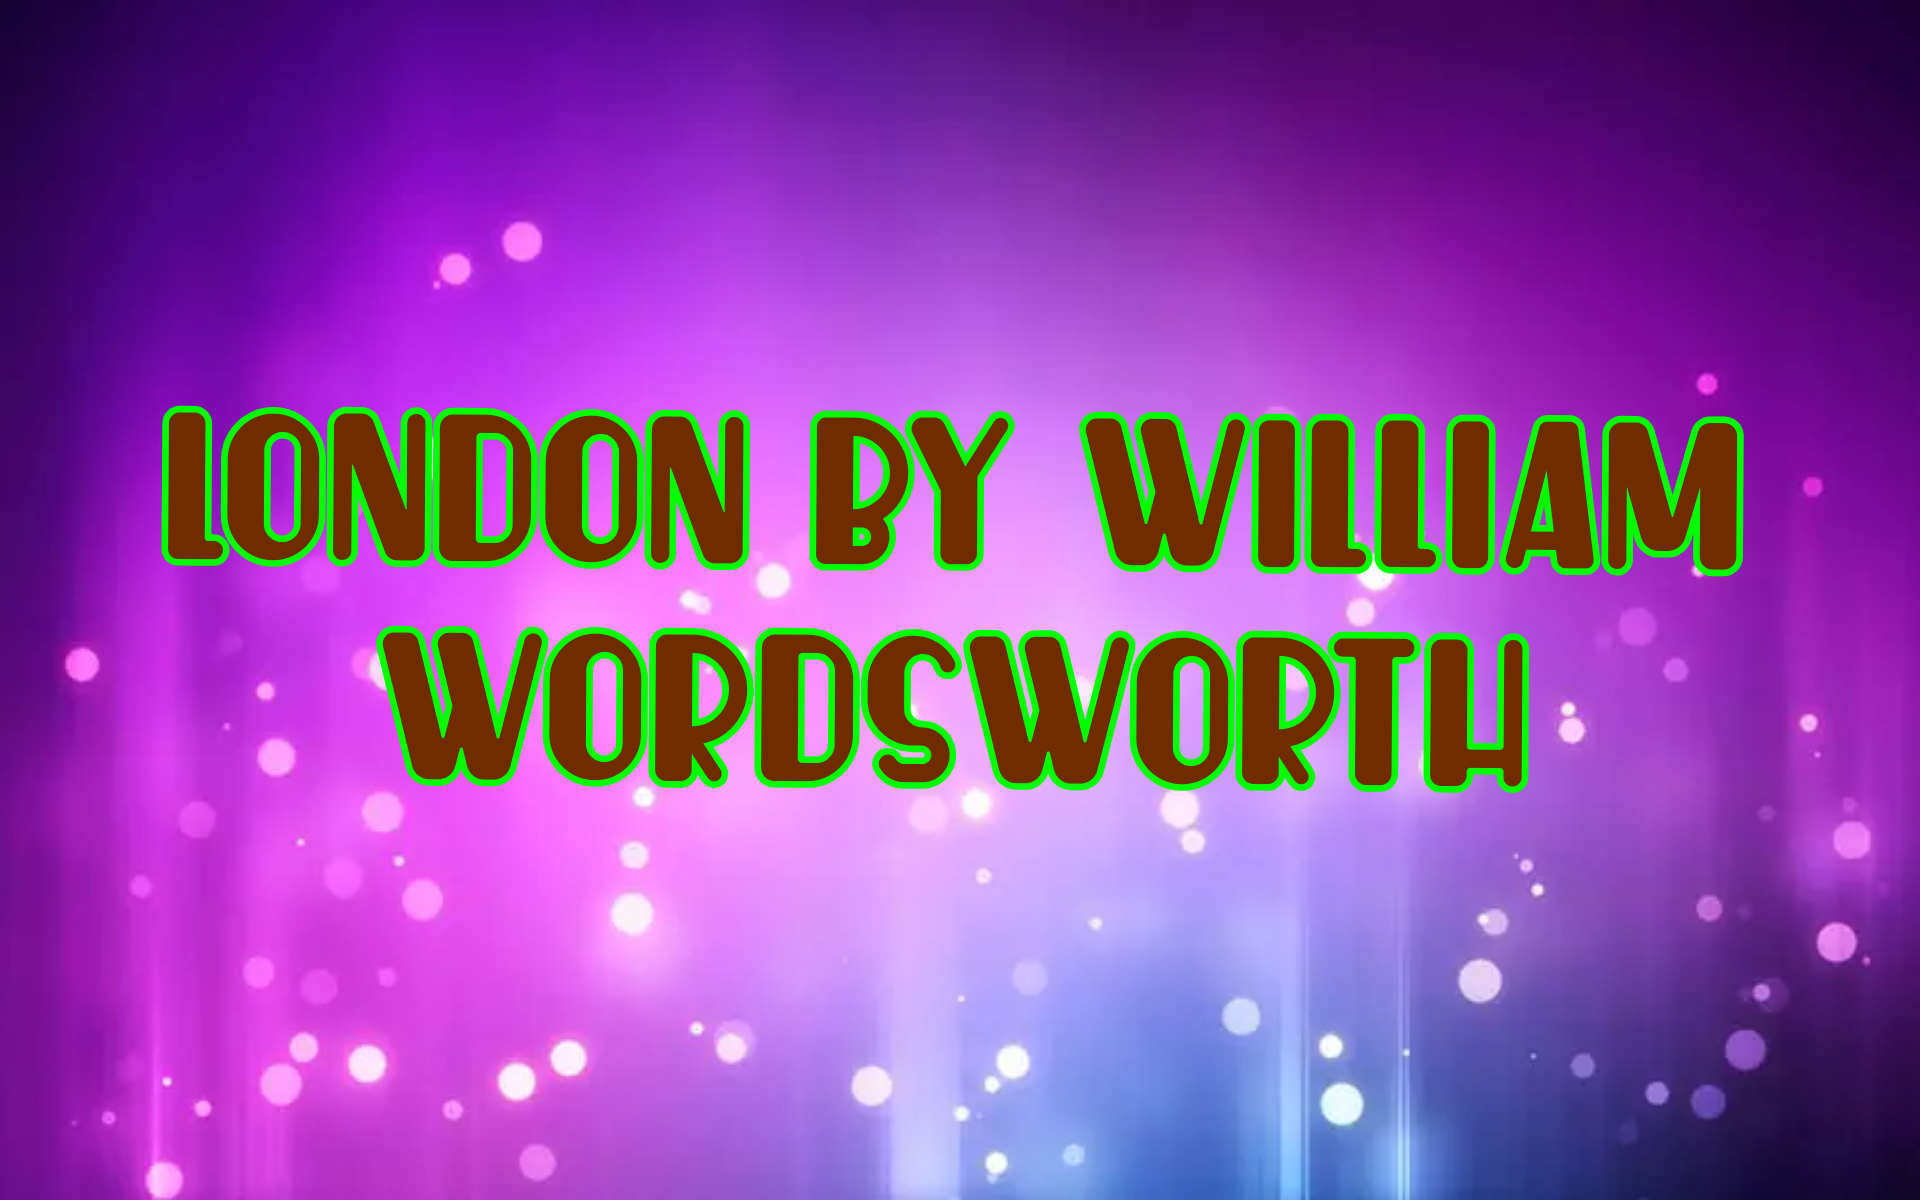 London, 1802 By William Wordsworth Summary 7